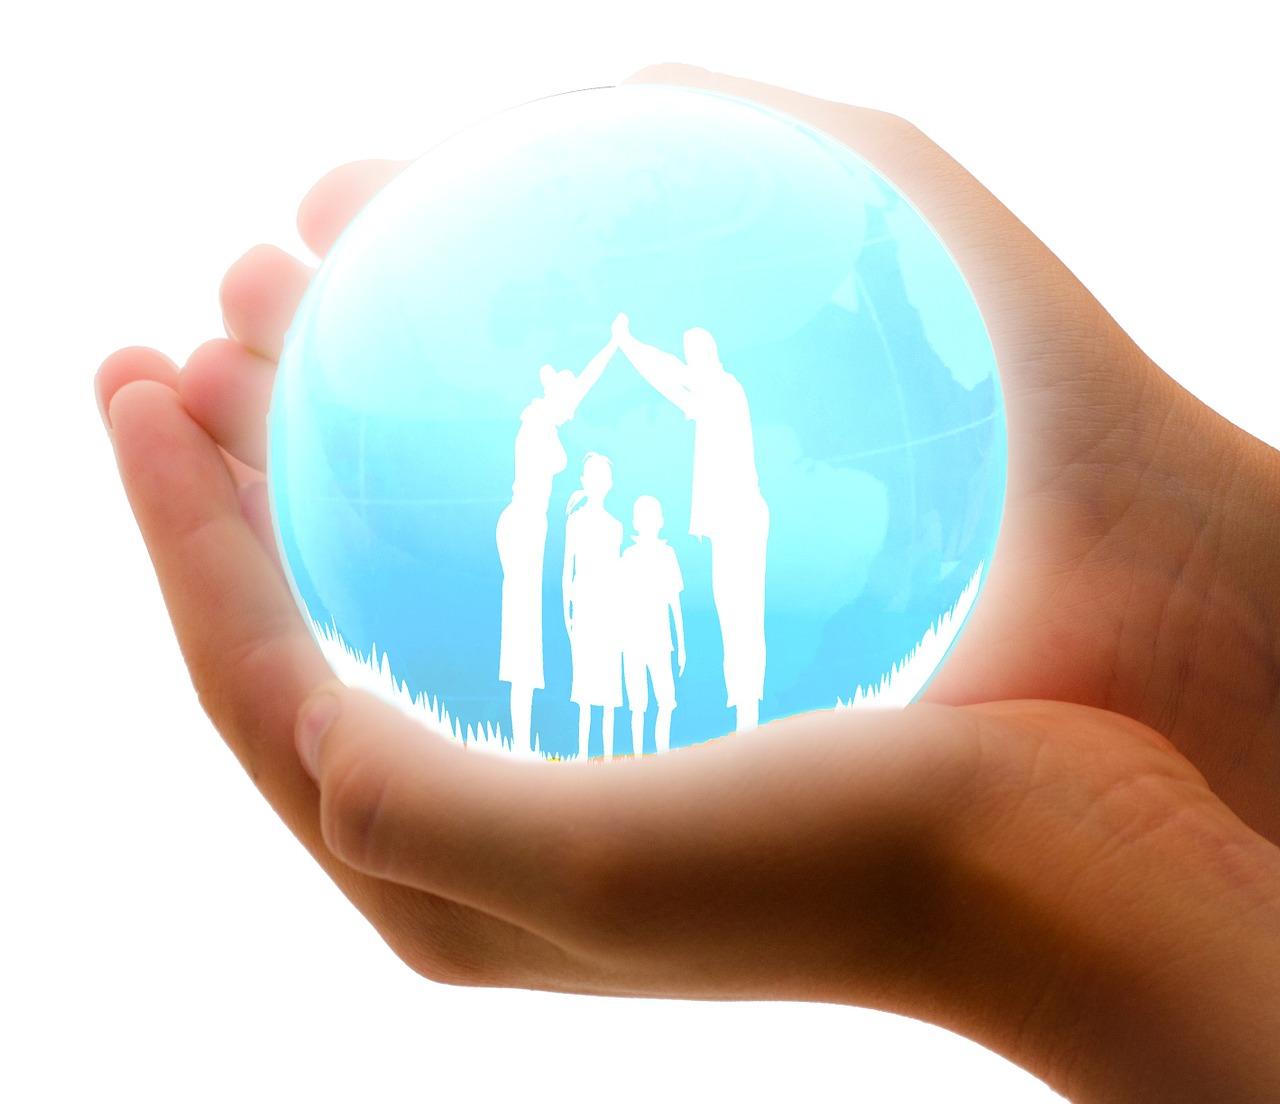 http://www.katharina-sieglinde-soreia-helmich.de/wp-content/uploads/2016/06/family-insurance-1316543_1280.jpg